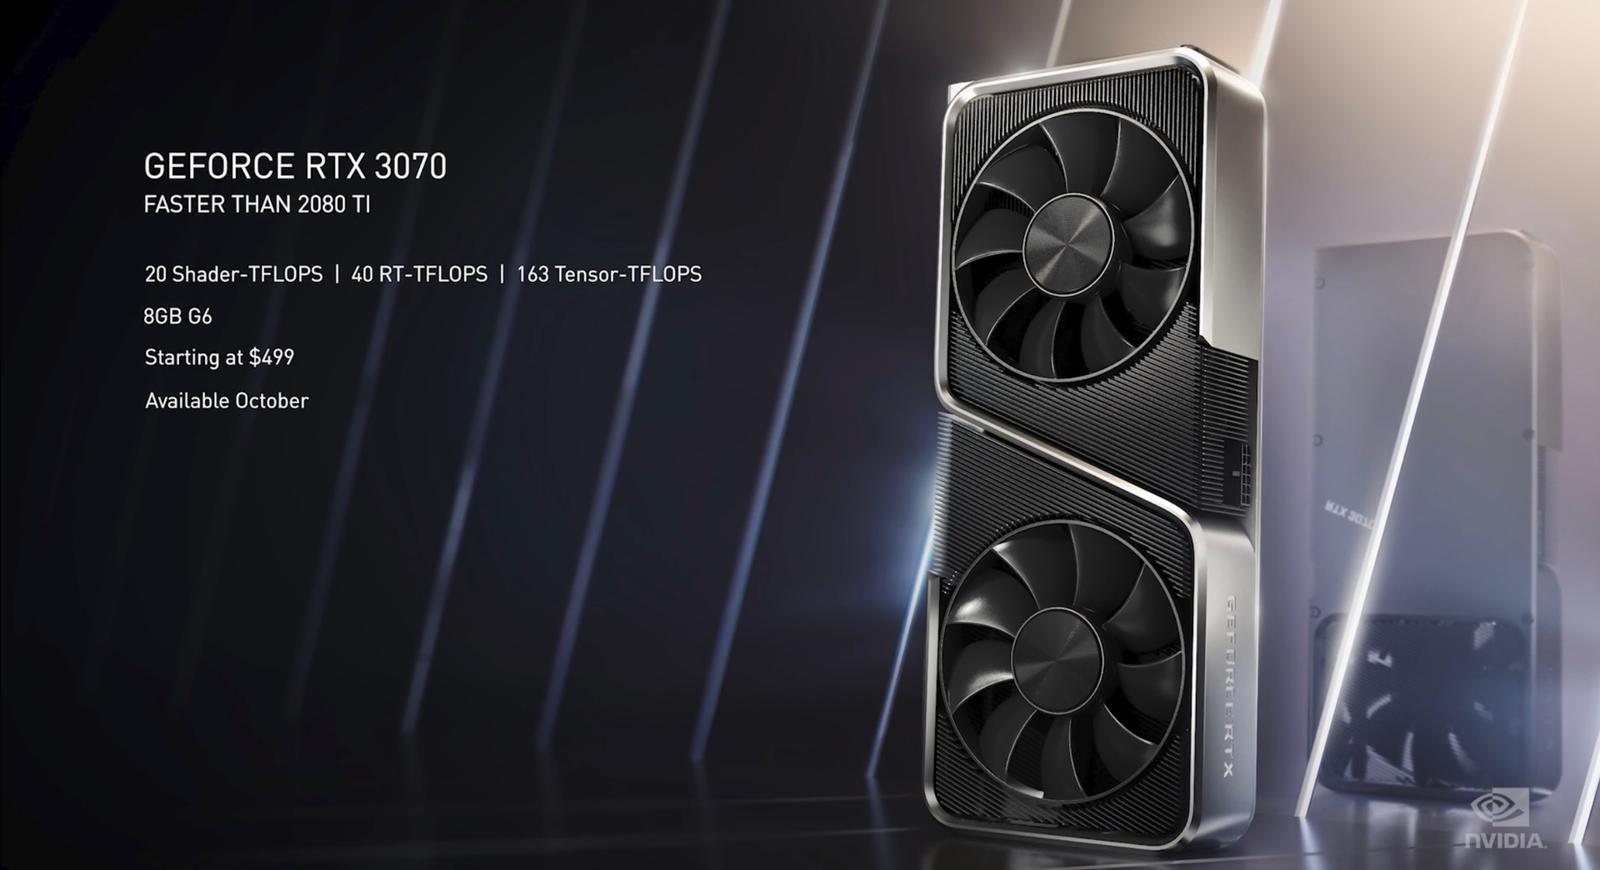 The NVIDIA GeForce RTX 3070.